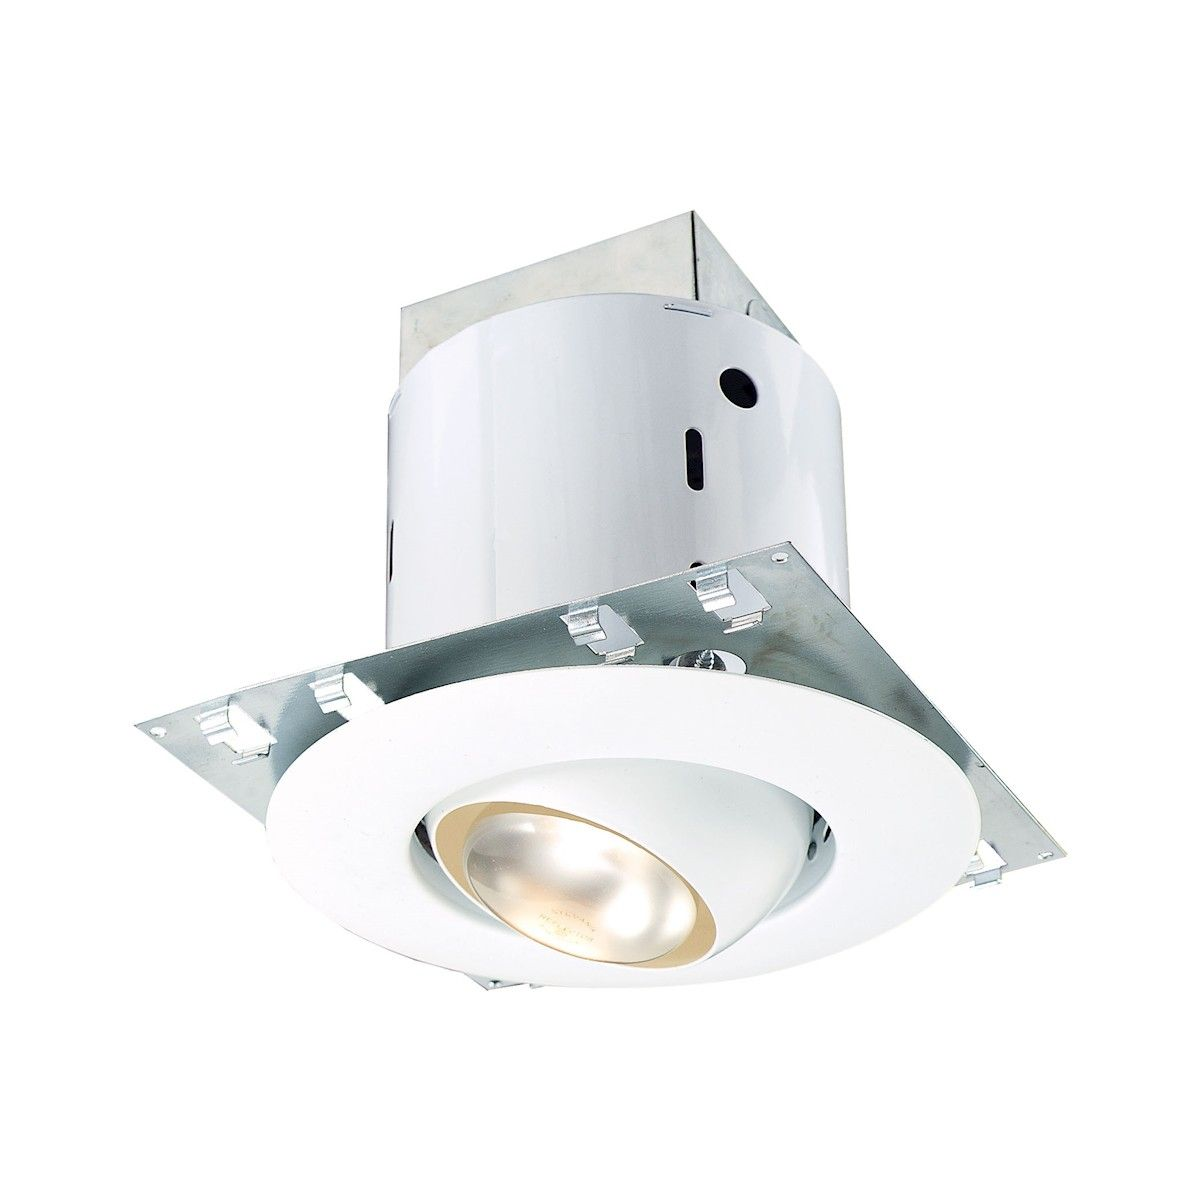 Thomas Lighting Dy6410 Recessed Kit Recessed Recessed Lighting